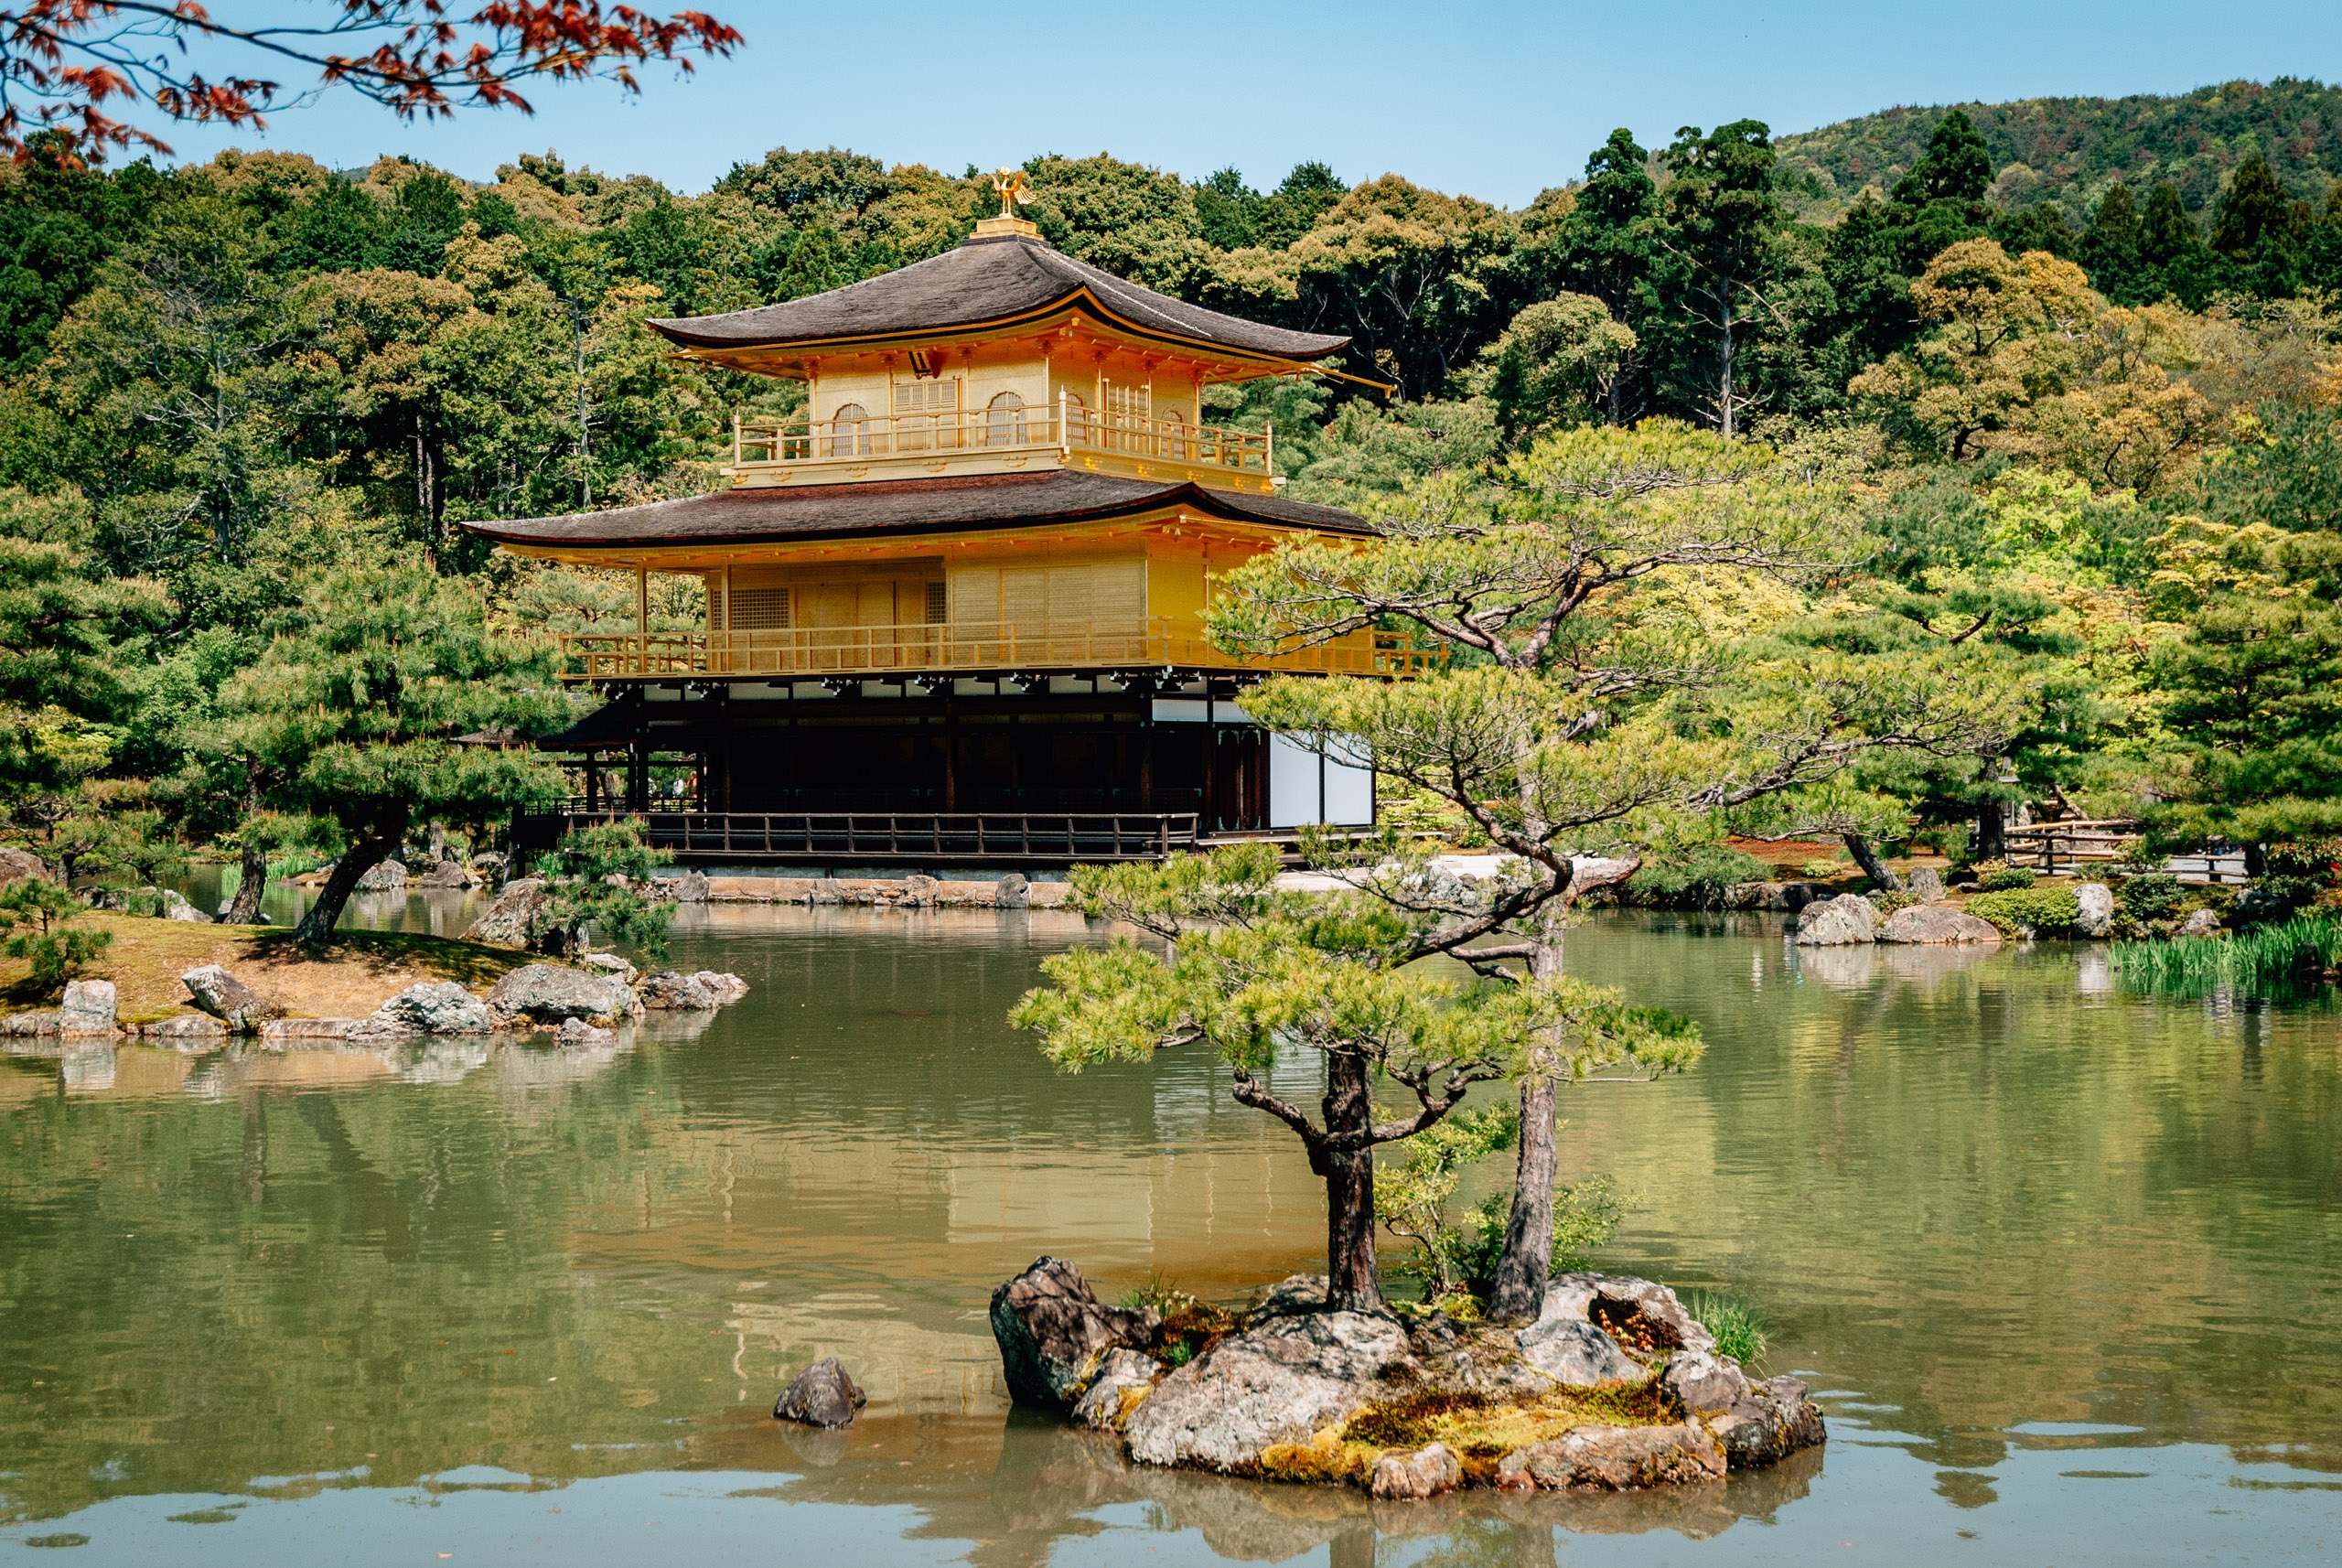 Japan - Tokyo Kyoto & Nikko - 2010-0427-DSC_0108_24427